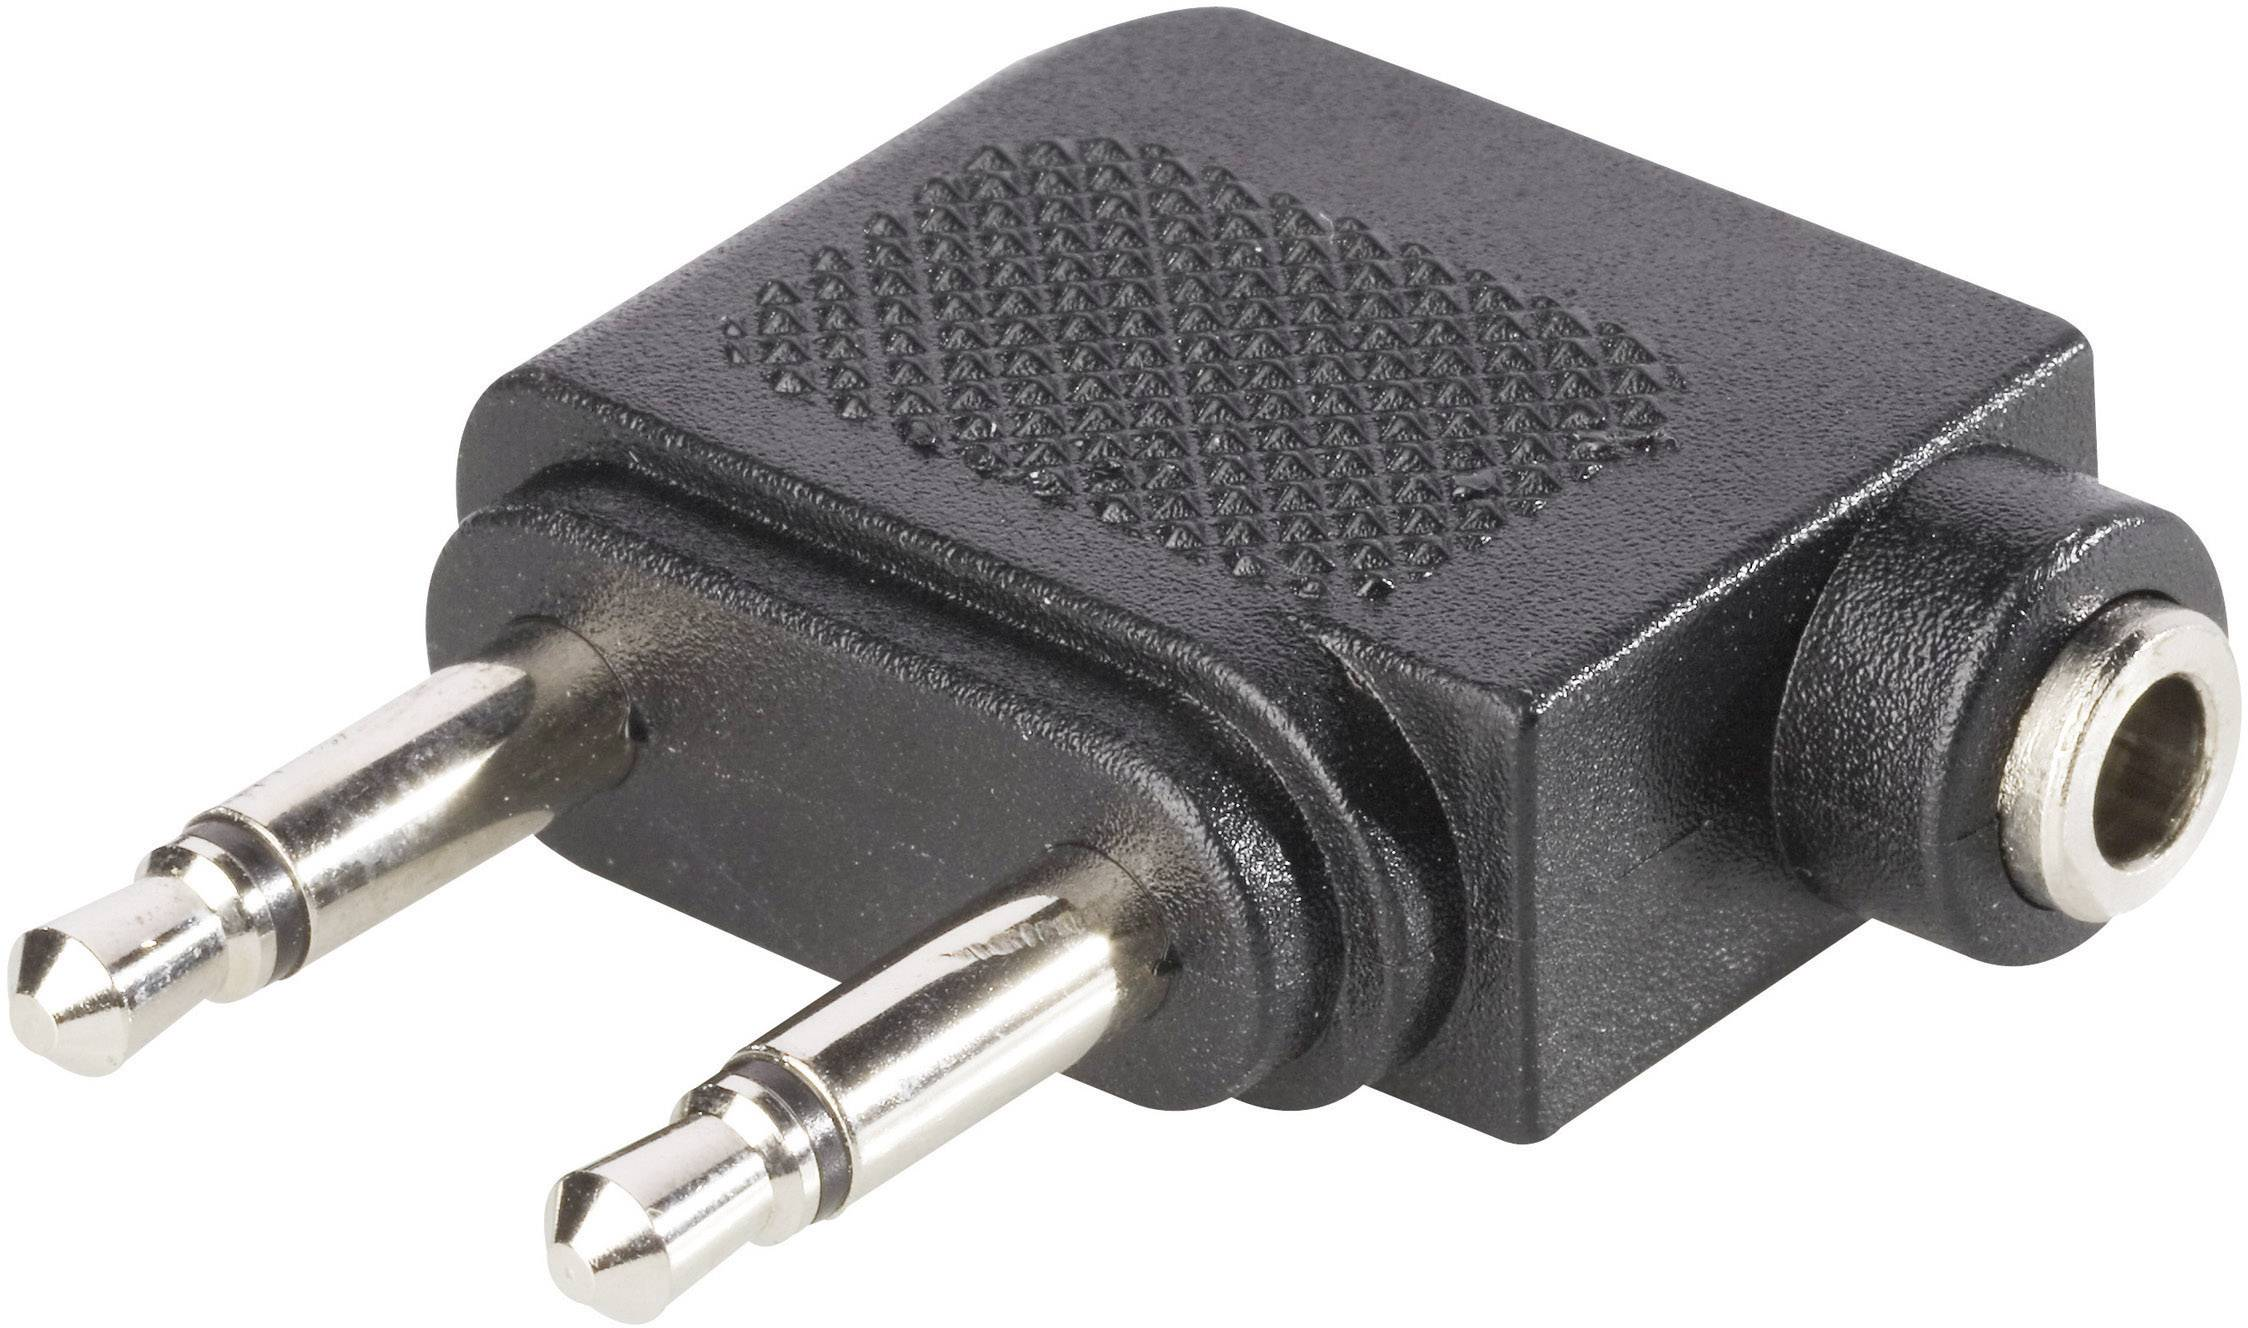 Jack audio Y adaptér BKL Electronic 1102031, čierna